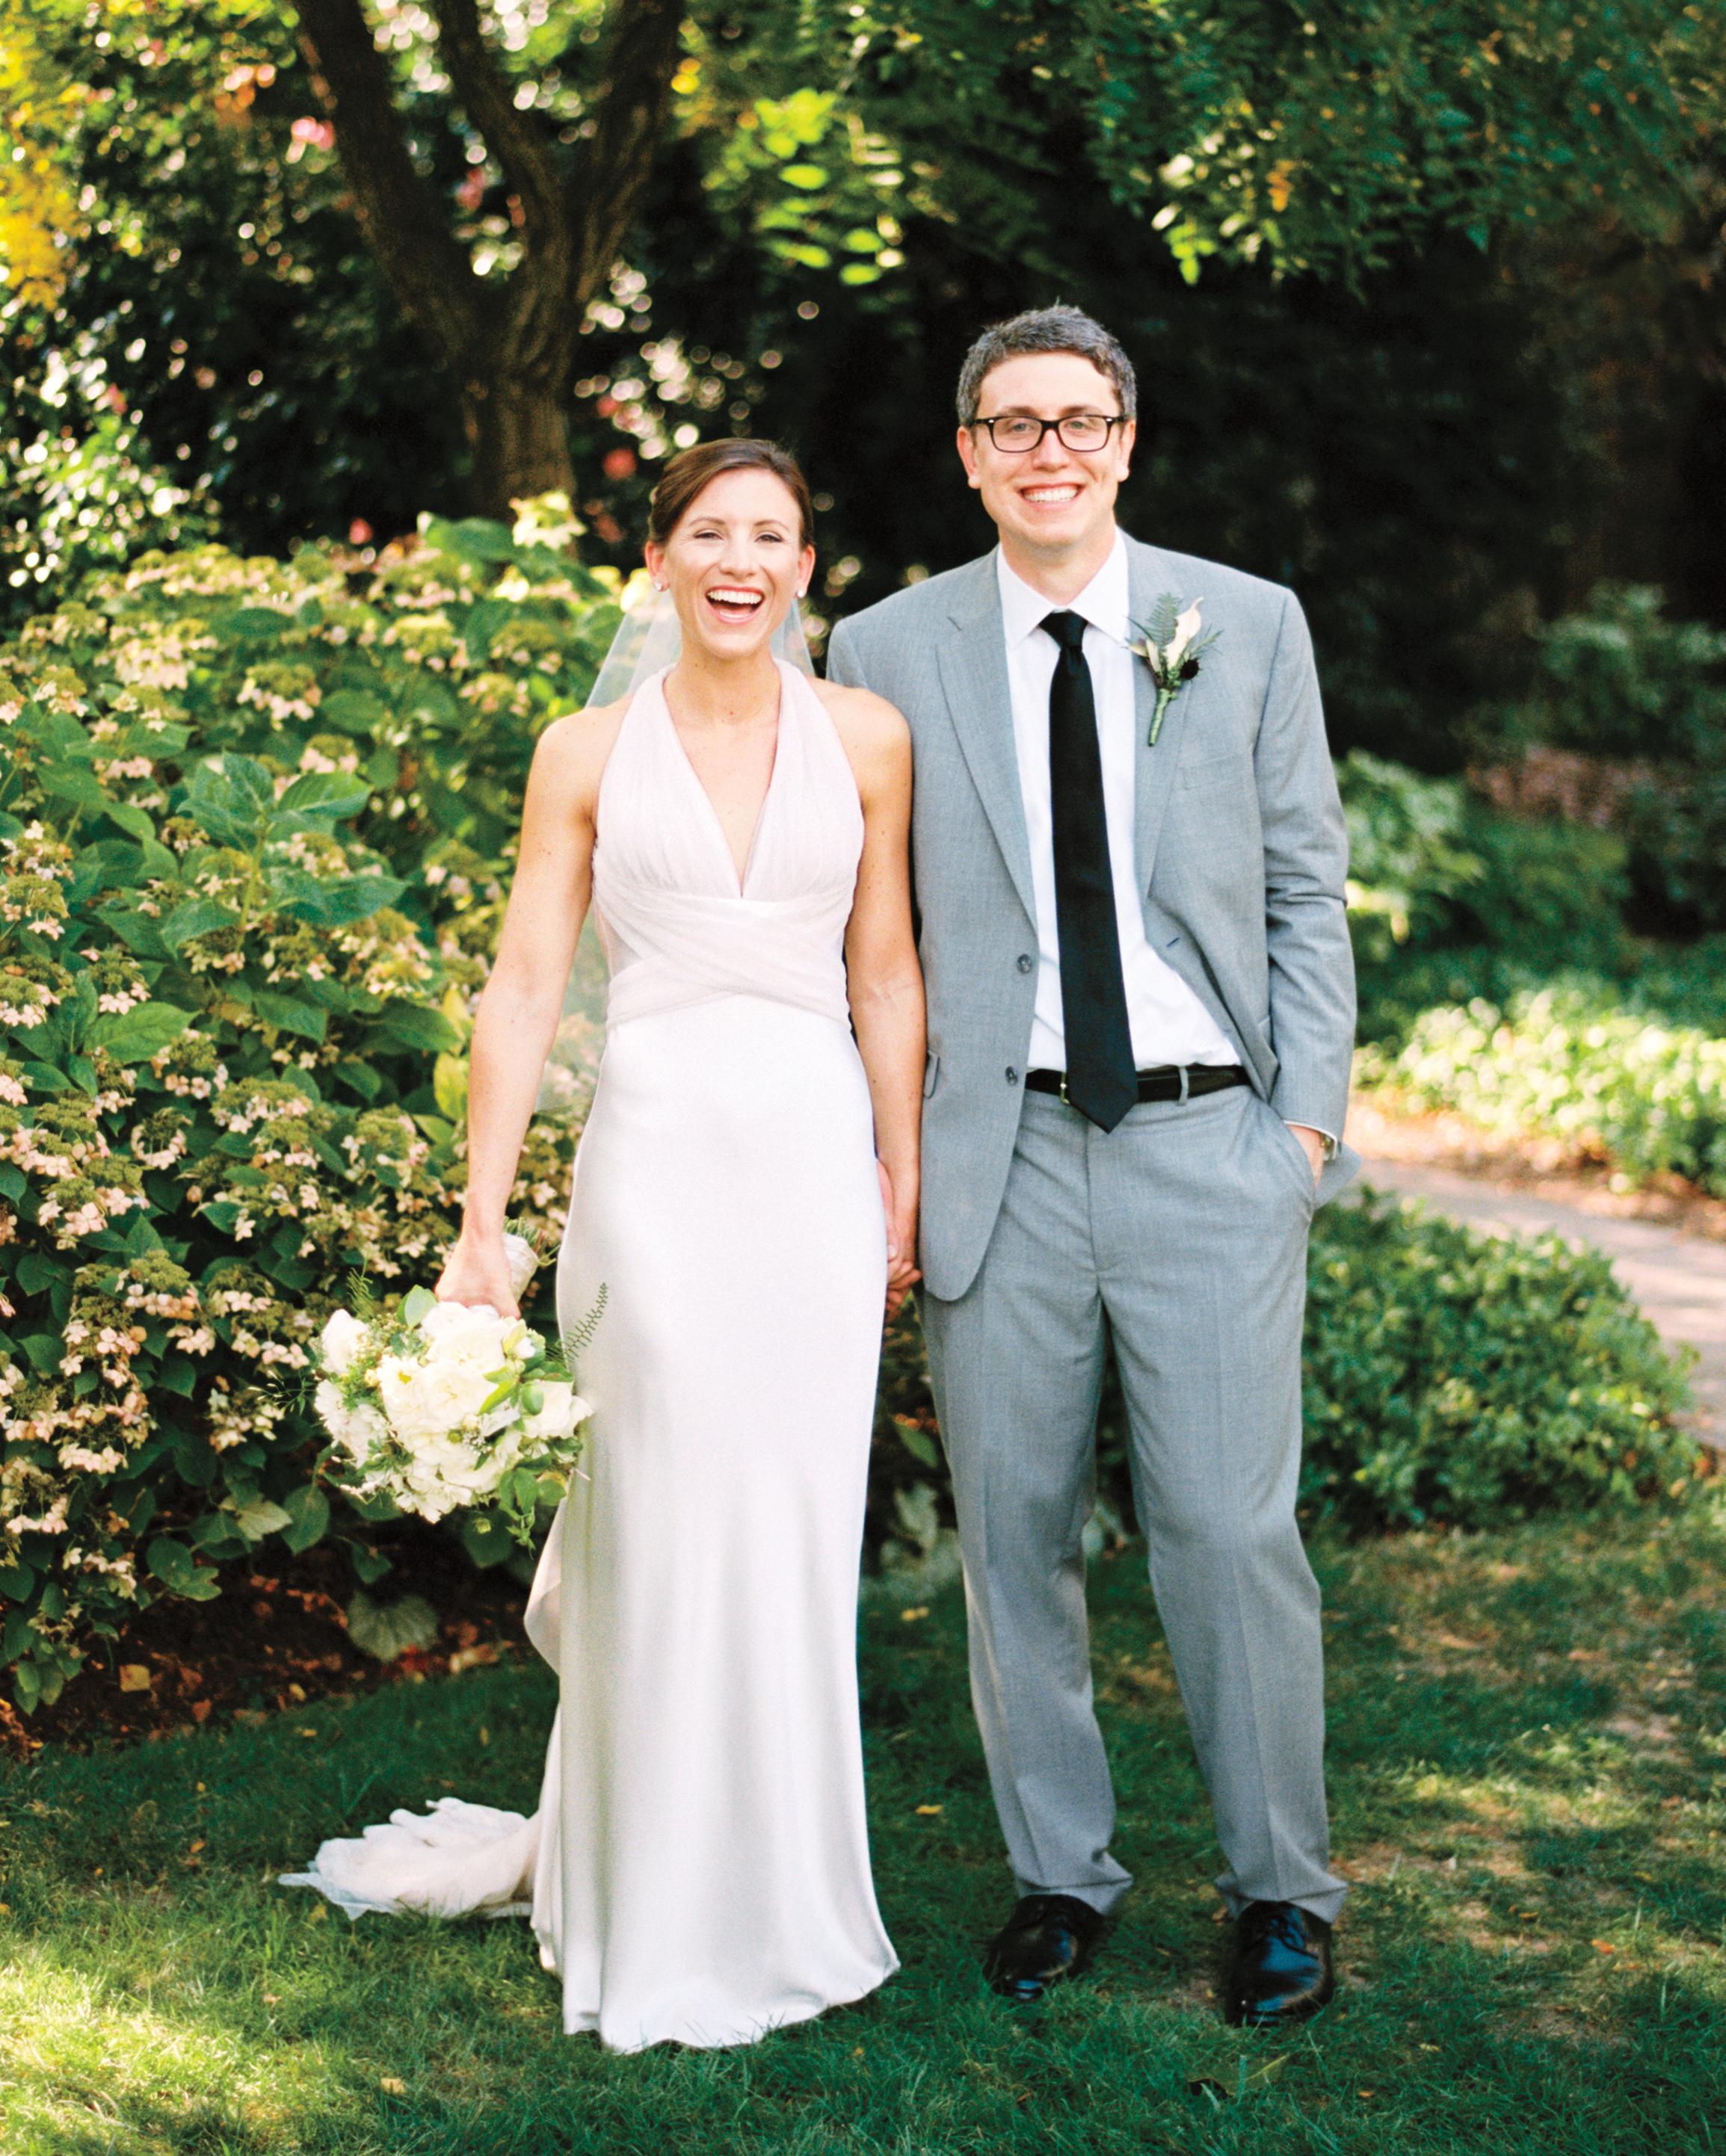 kathryn-jon-wedding-dcbg001-s111704.jpg